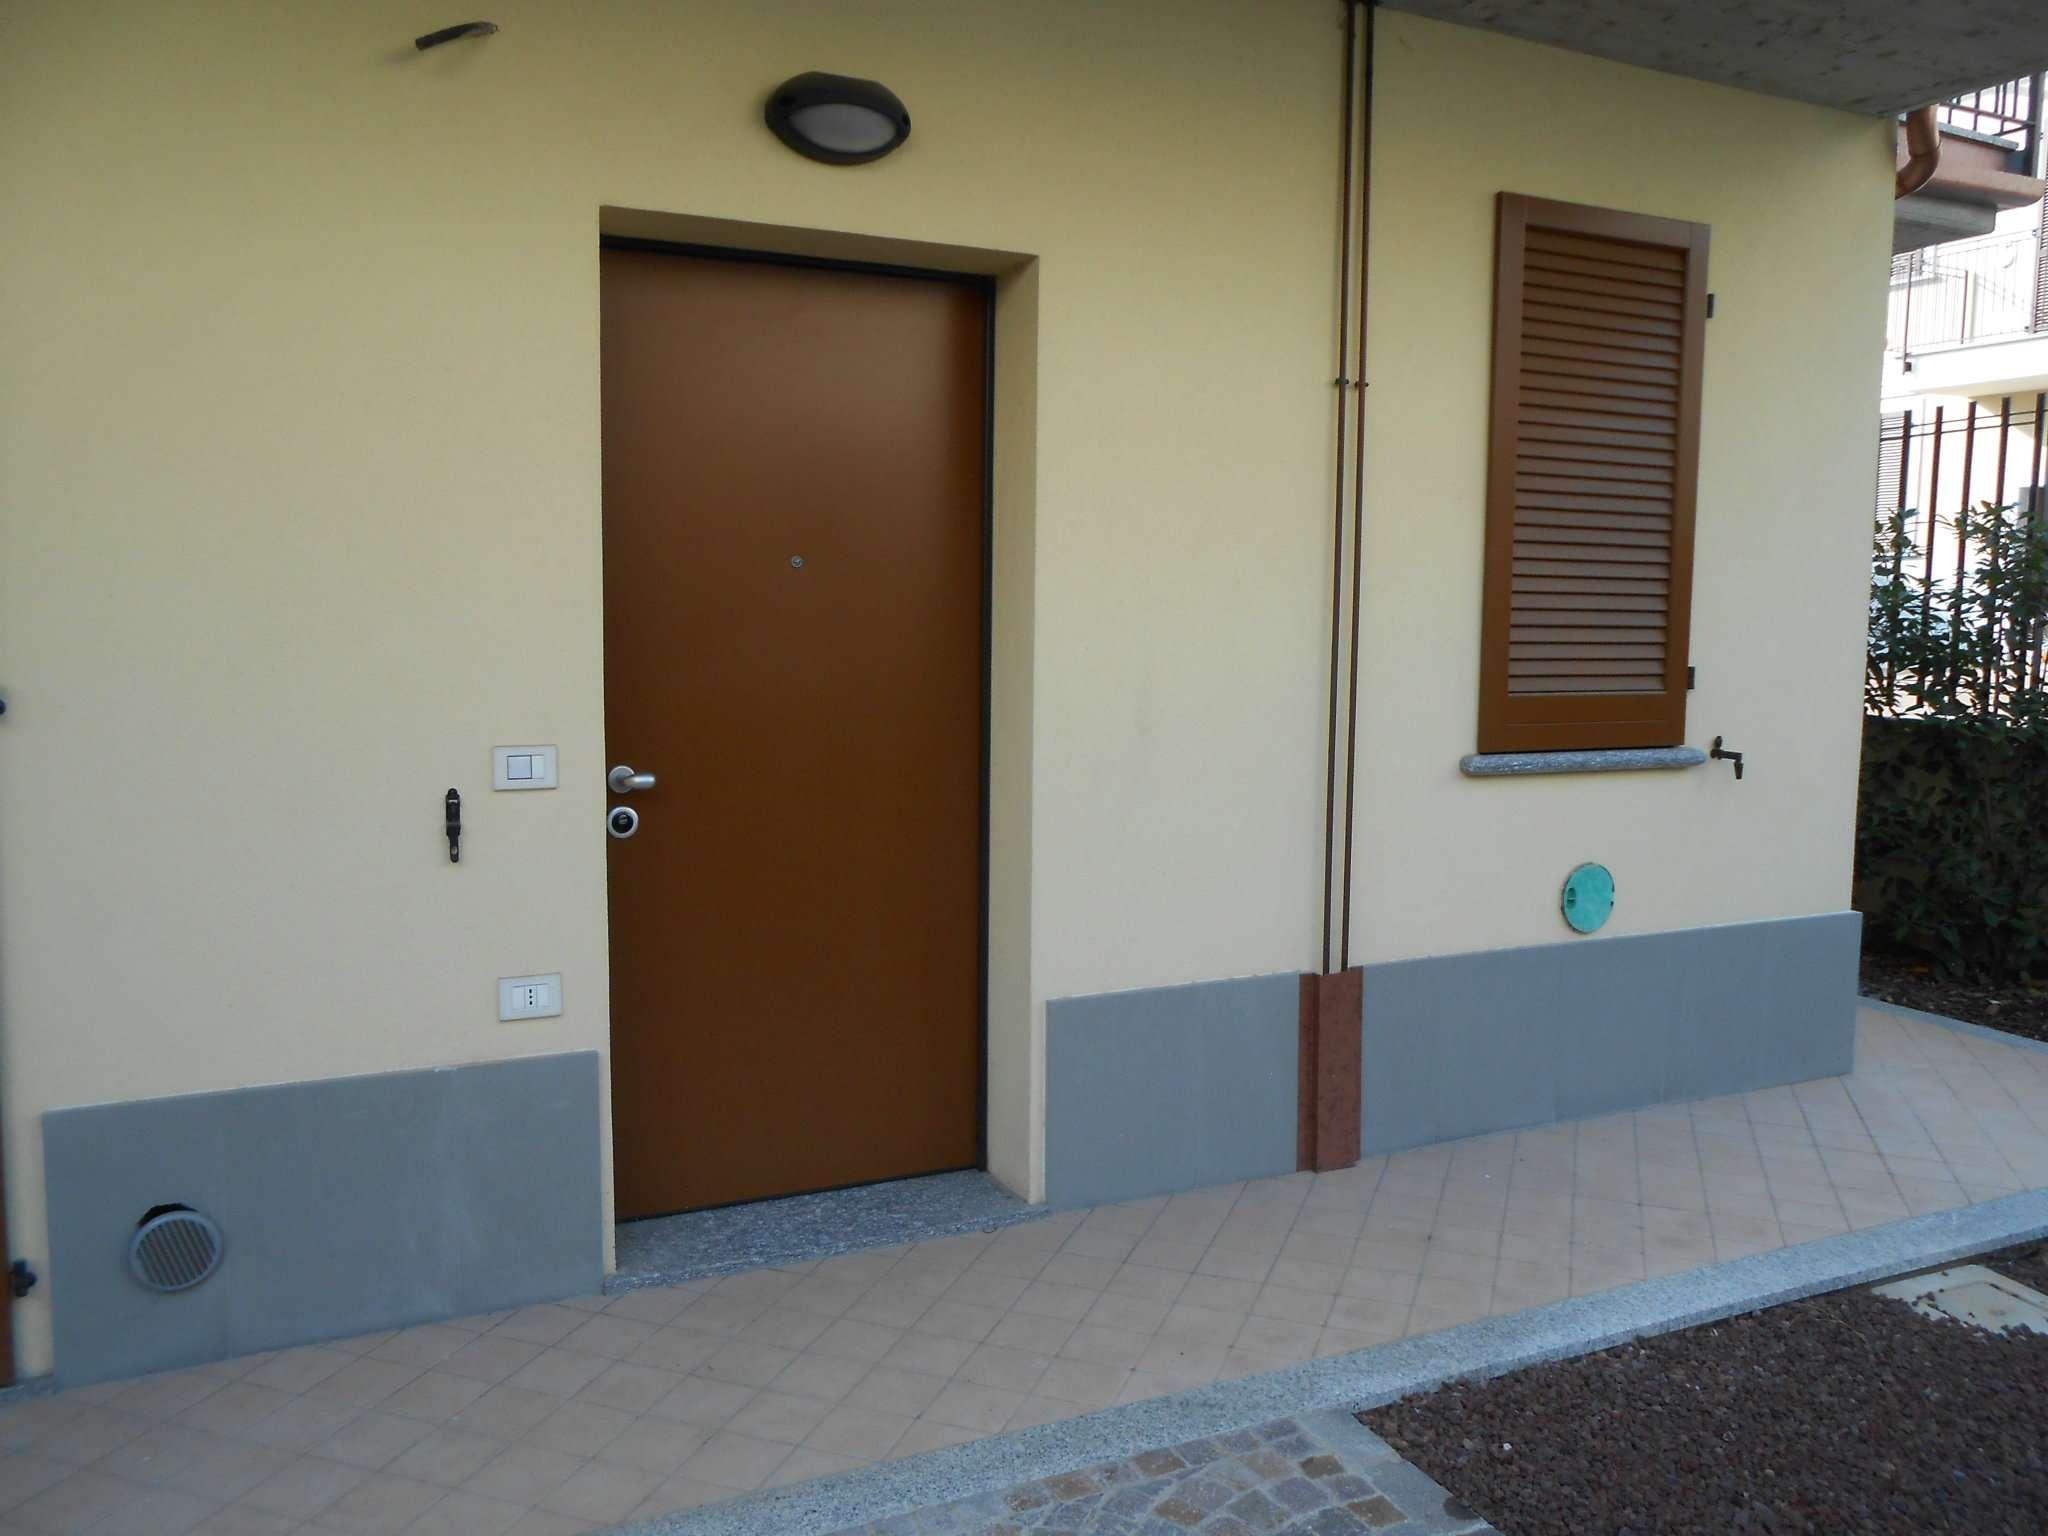 Bilocale Cavenago di Brianza Via Piave 5